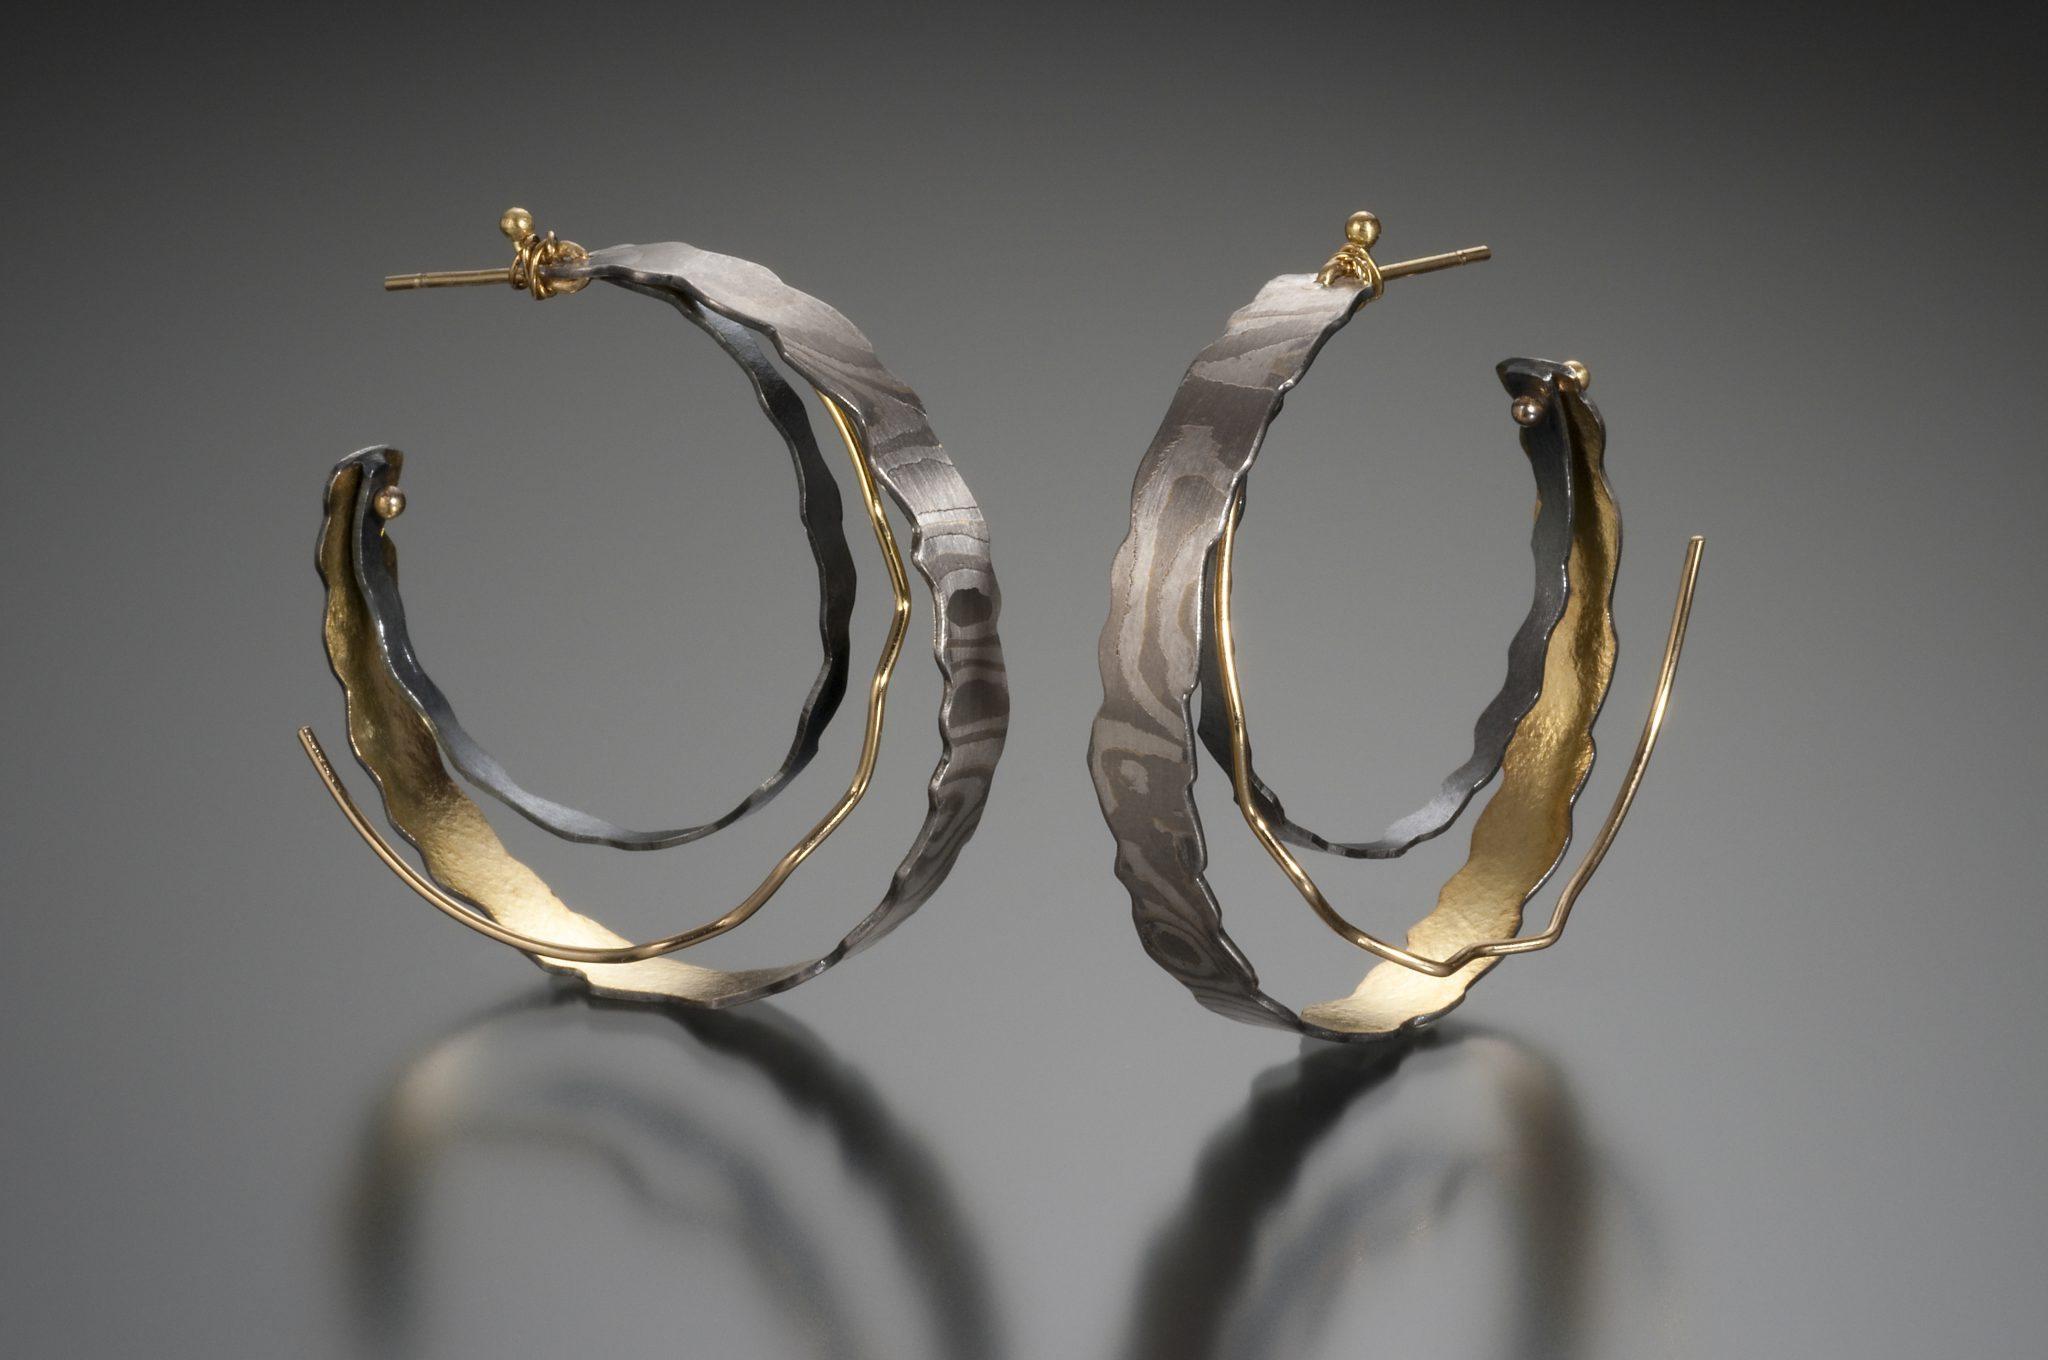 lisa jane grant, mokume, mixed metal jewelry gold 14k 18k yellow Palladium White gold contemporary rough edge organic Maine handmade unique Jewellery Earrings hoops Cali Columbia